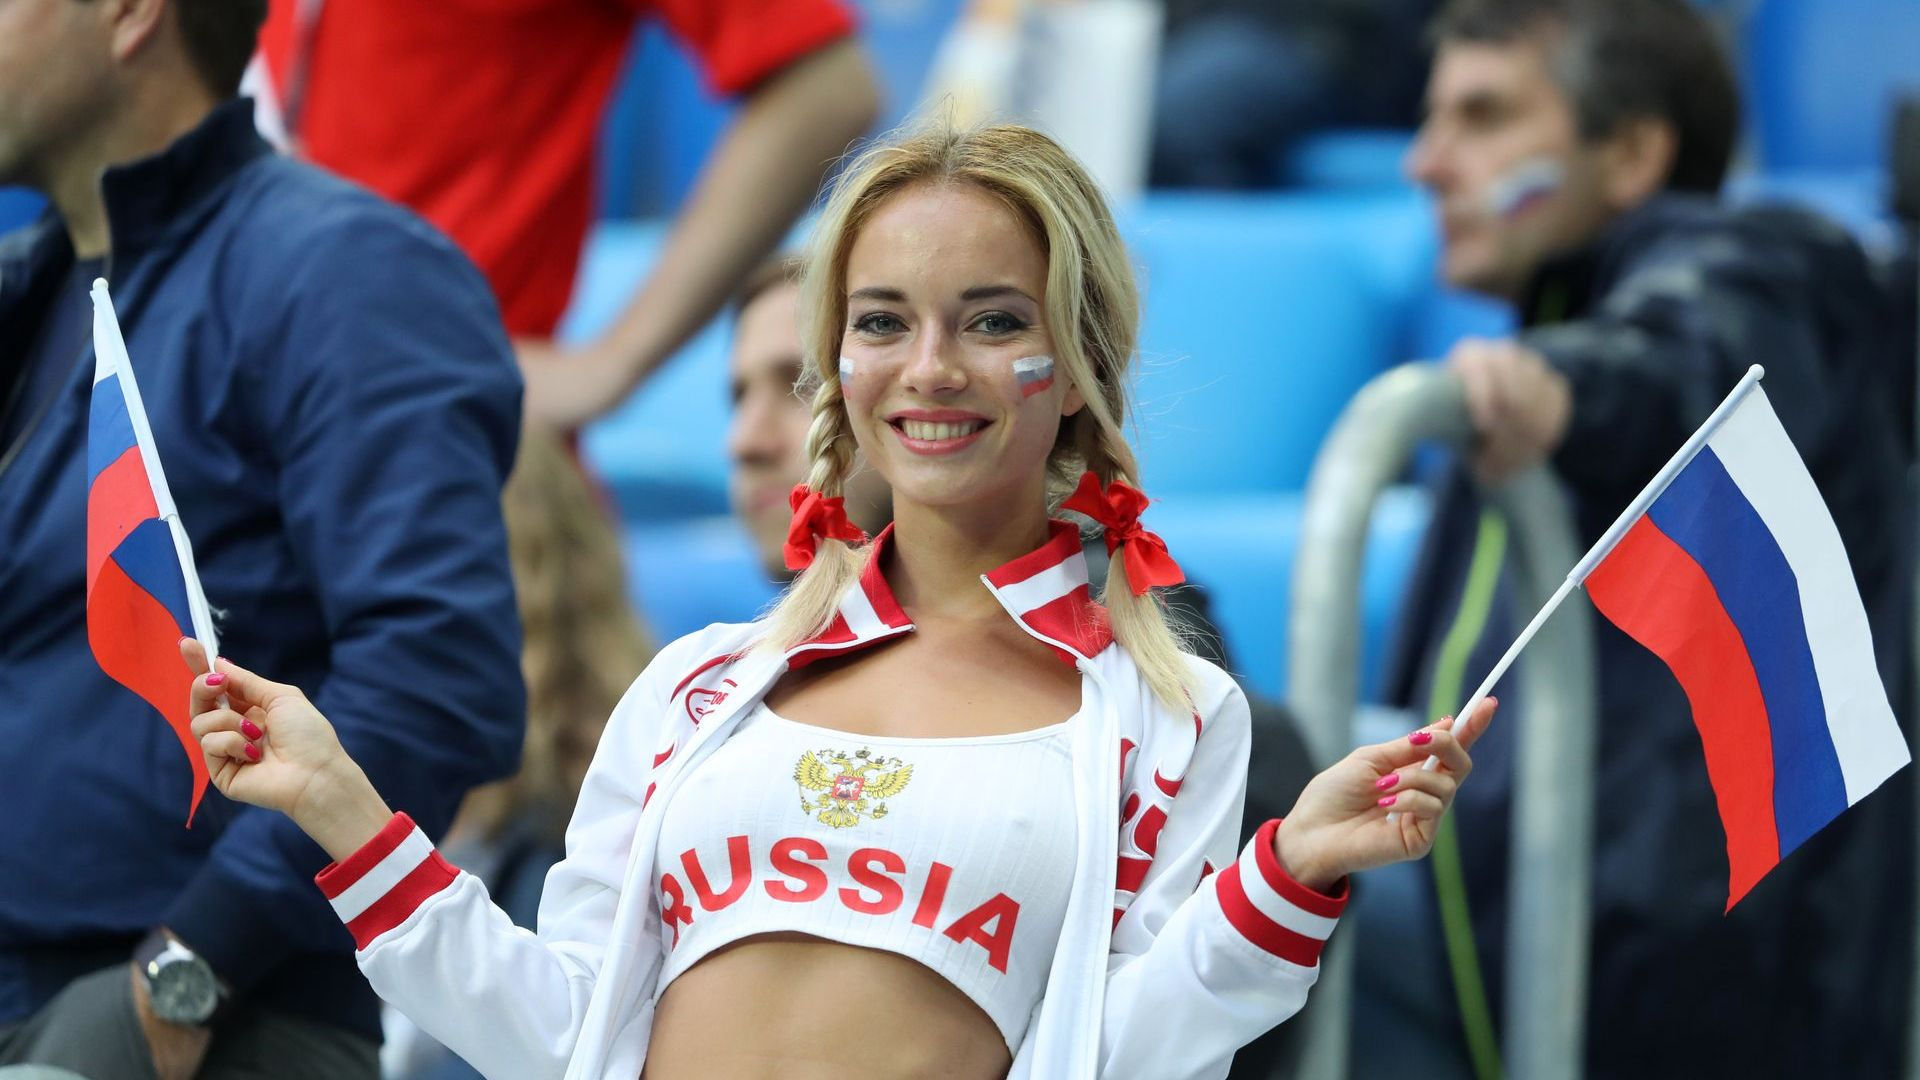 Атрактивна и популярна руска фенка от Мондиала се оказа порнозвезда